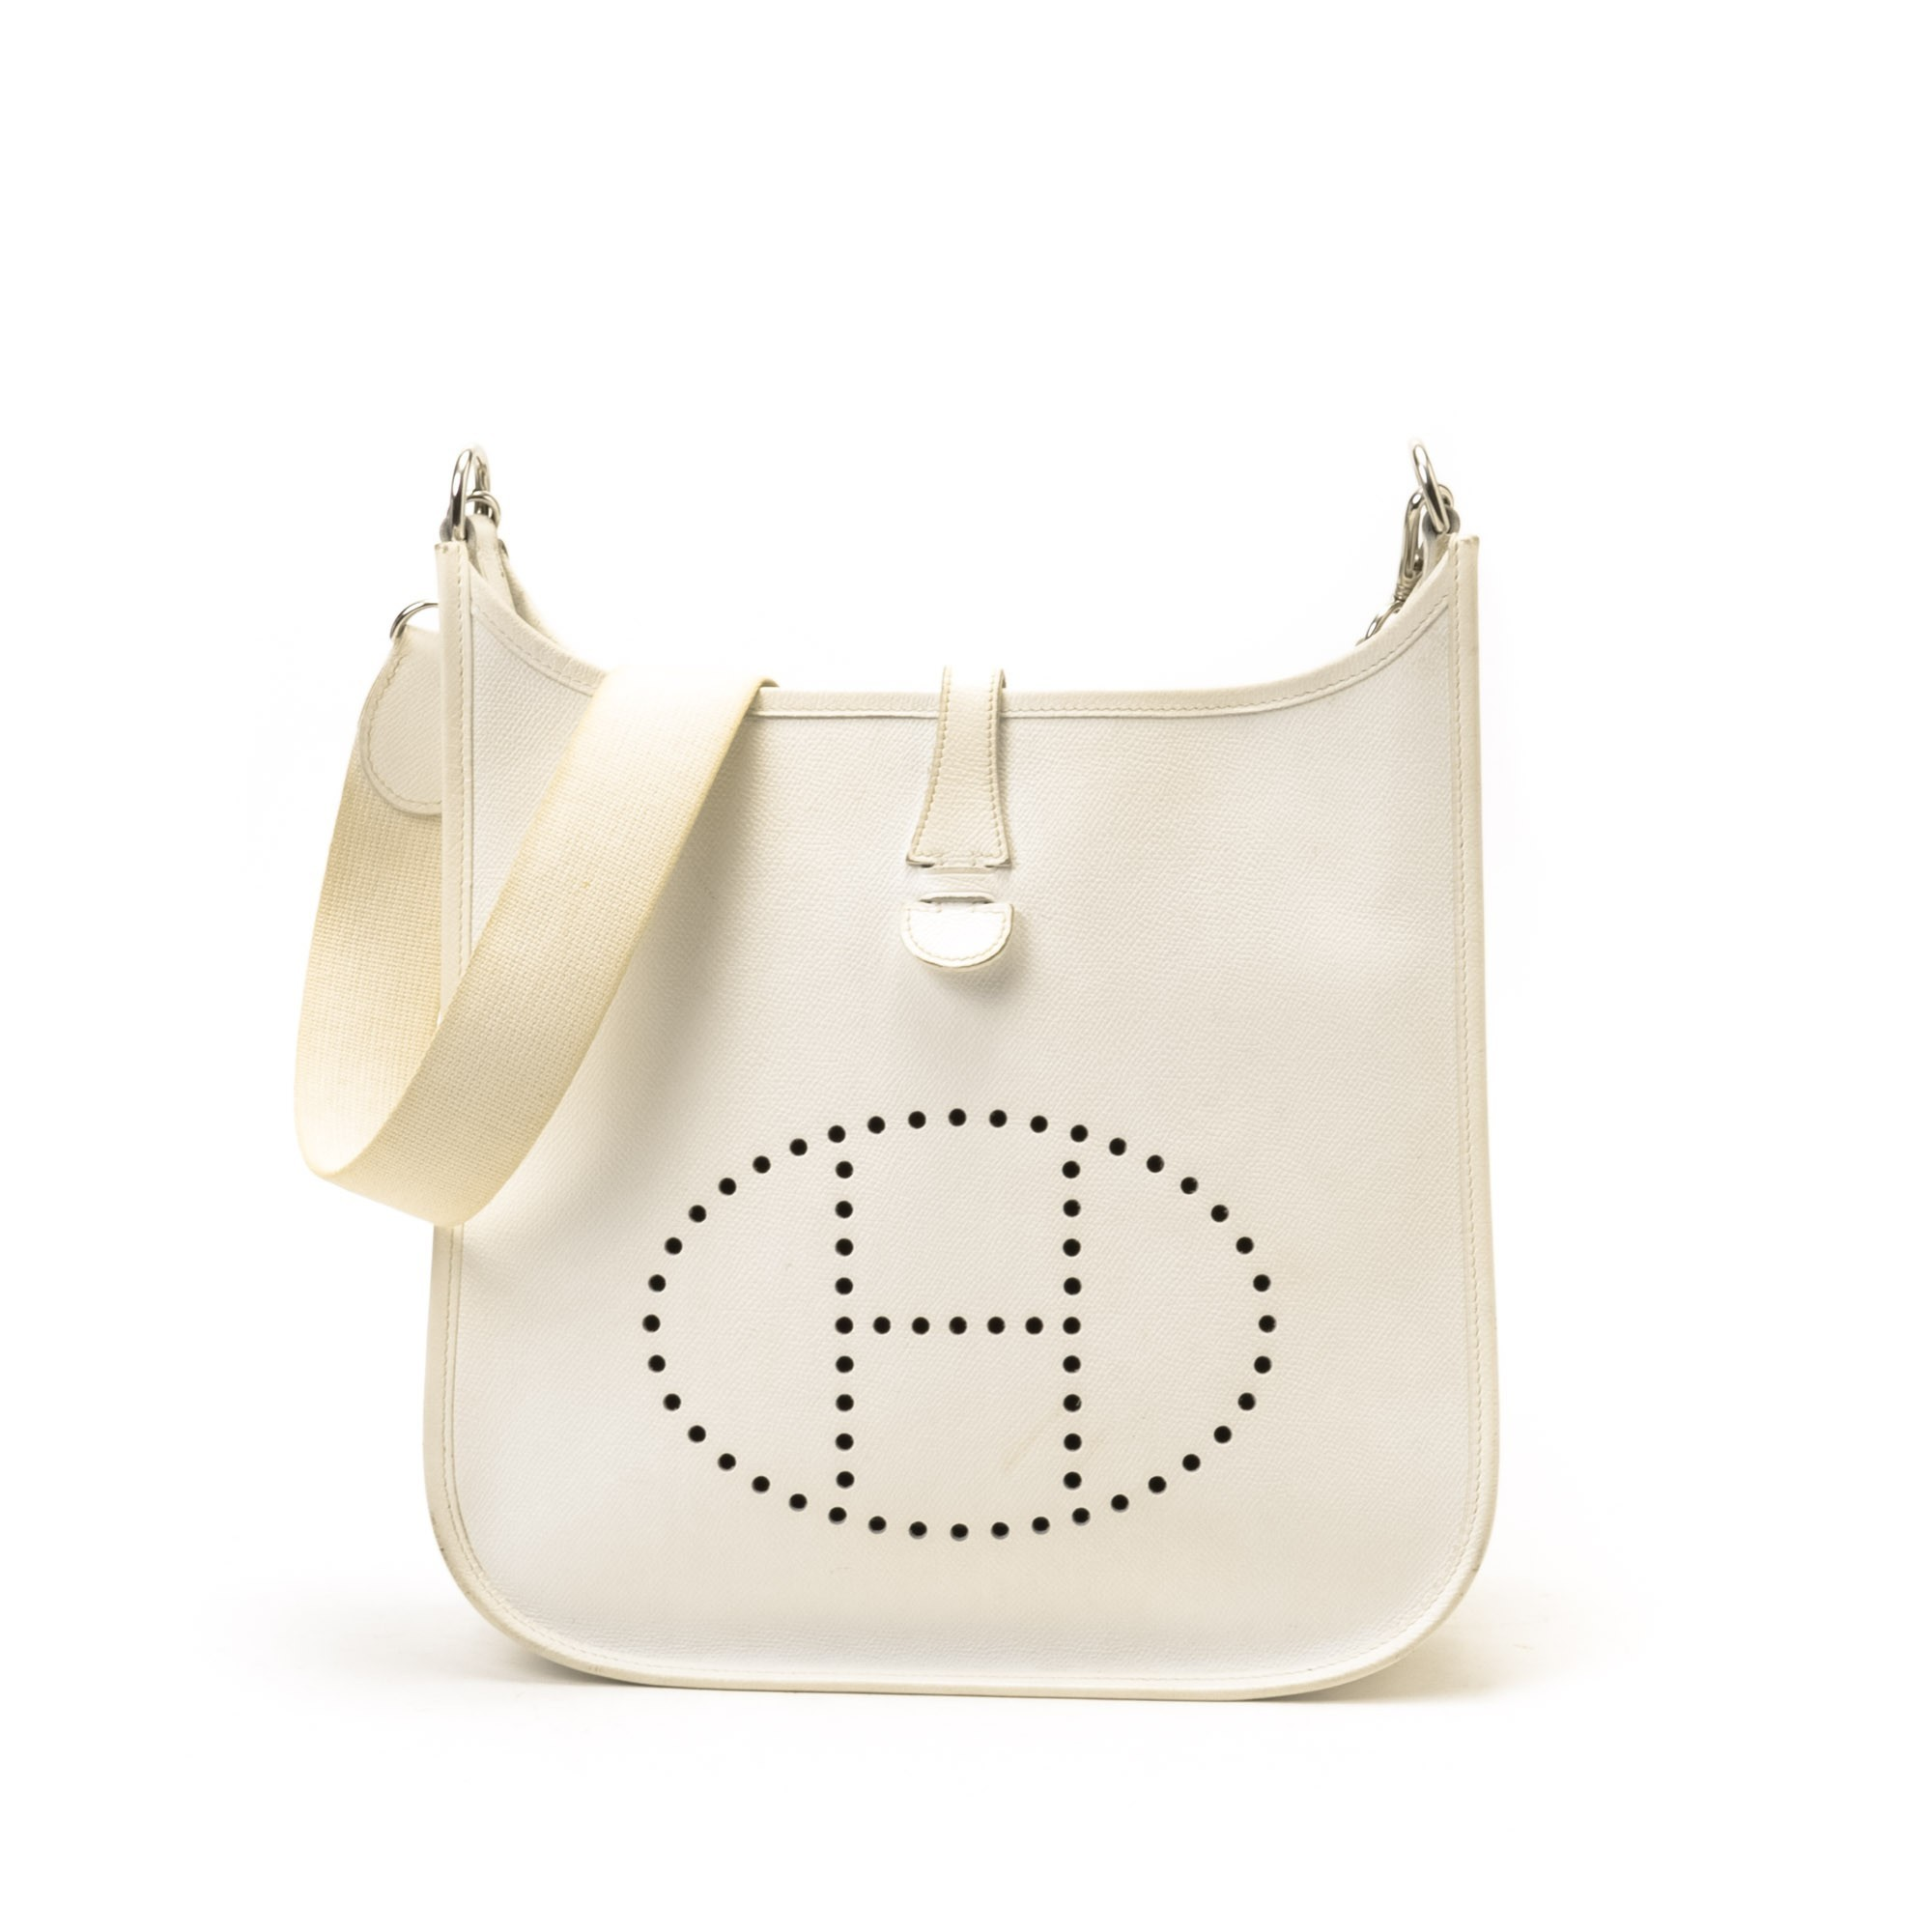 pink brighton purse - Herm��s Evelyne I PM Epsom White Calf Shoulder Bag - LXR&CO Vintage ...